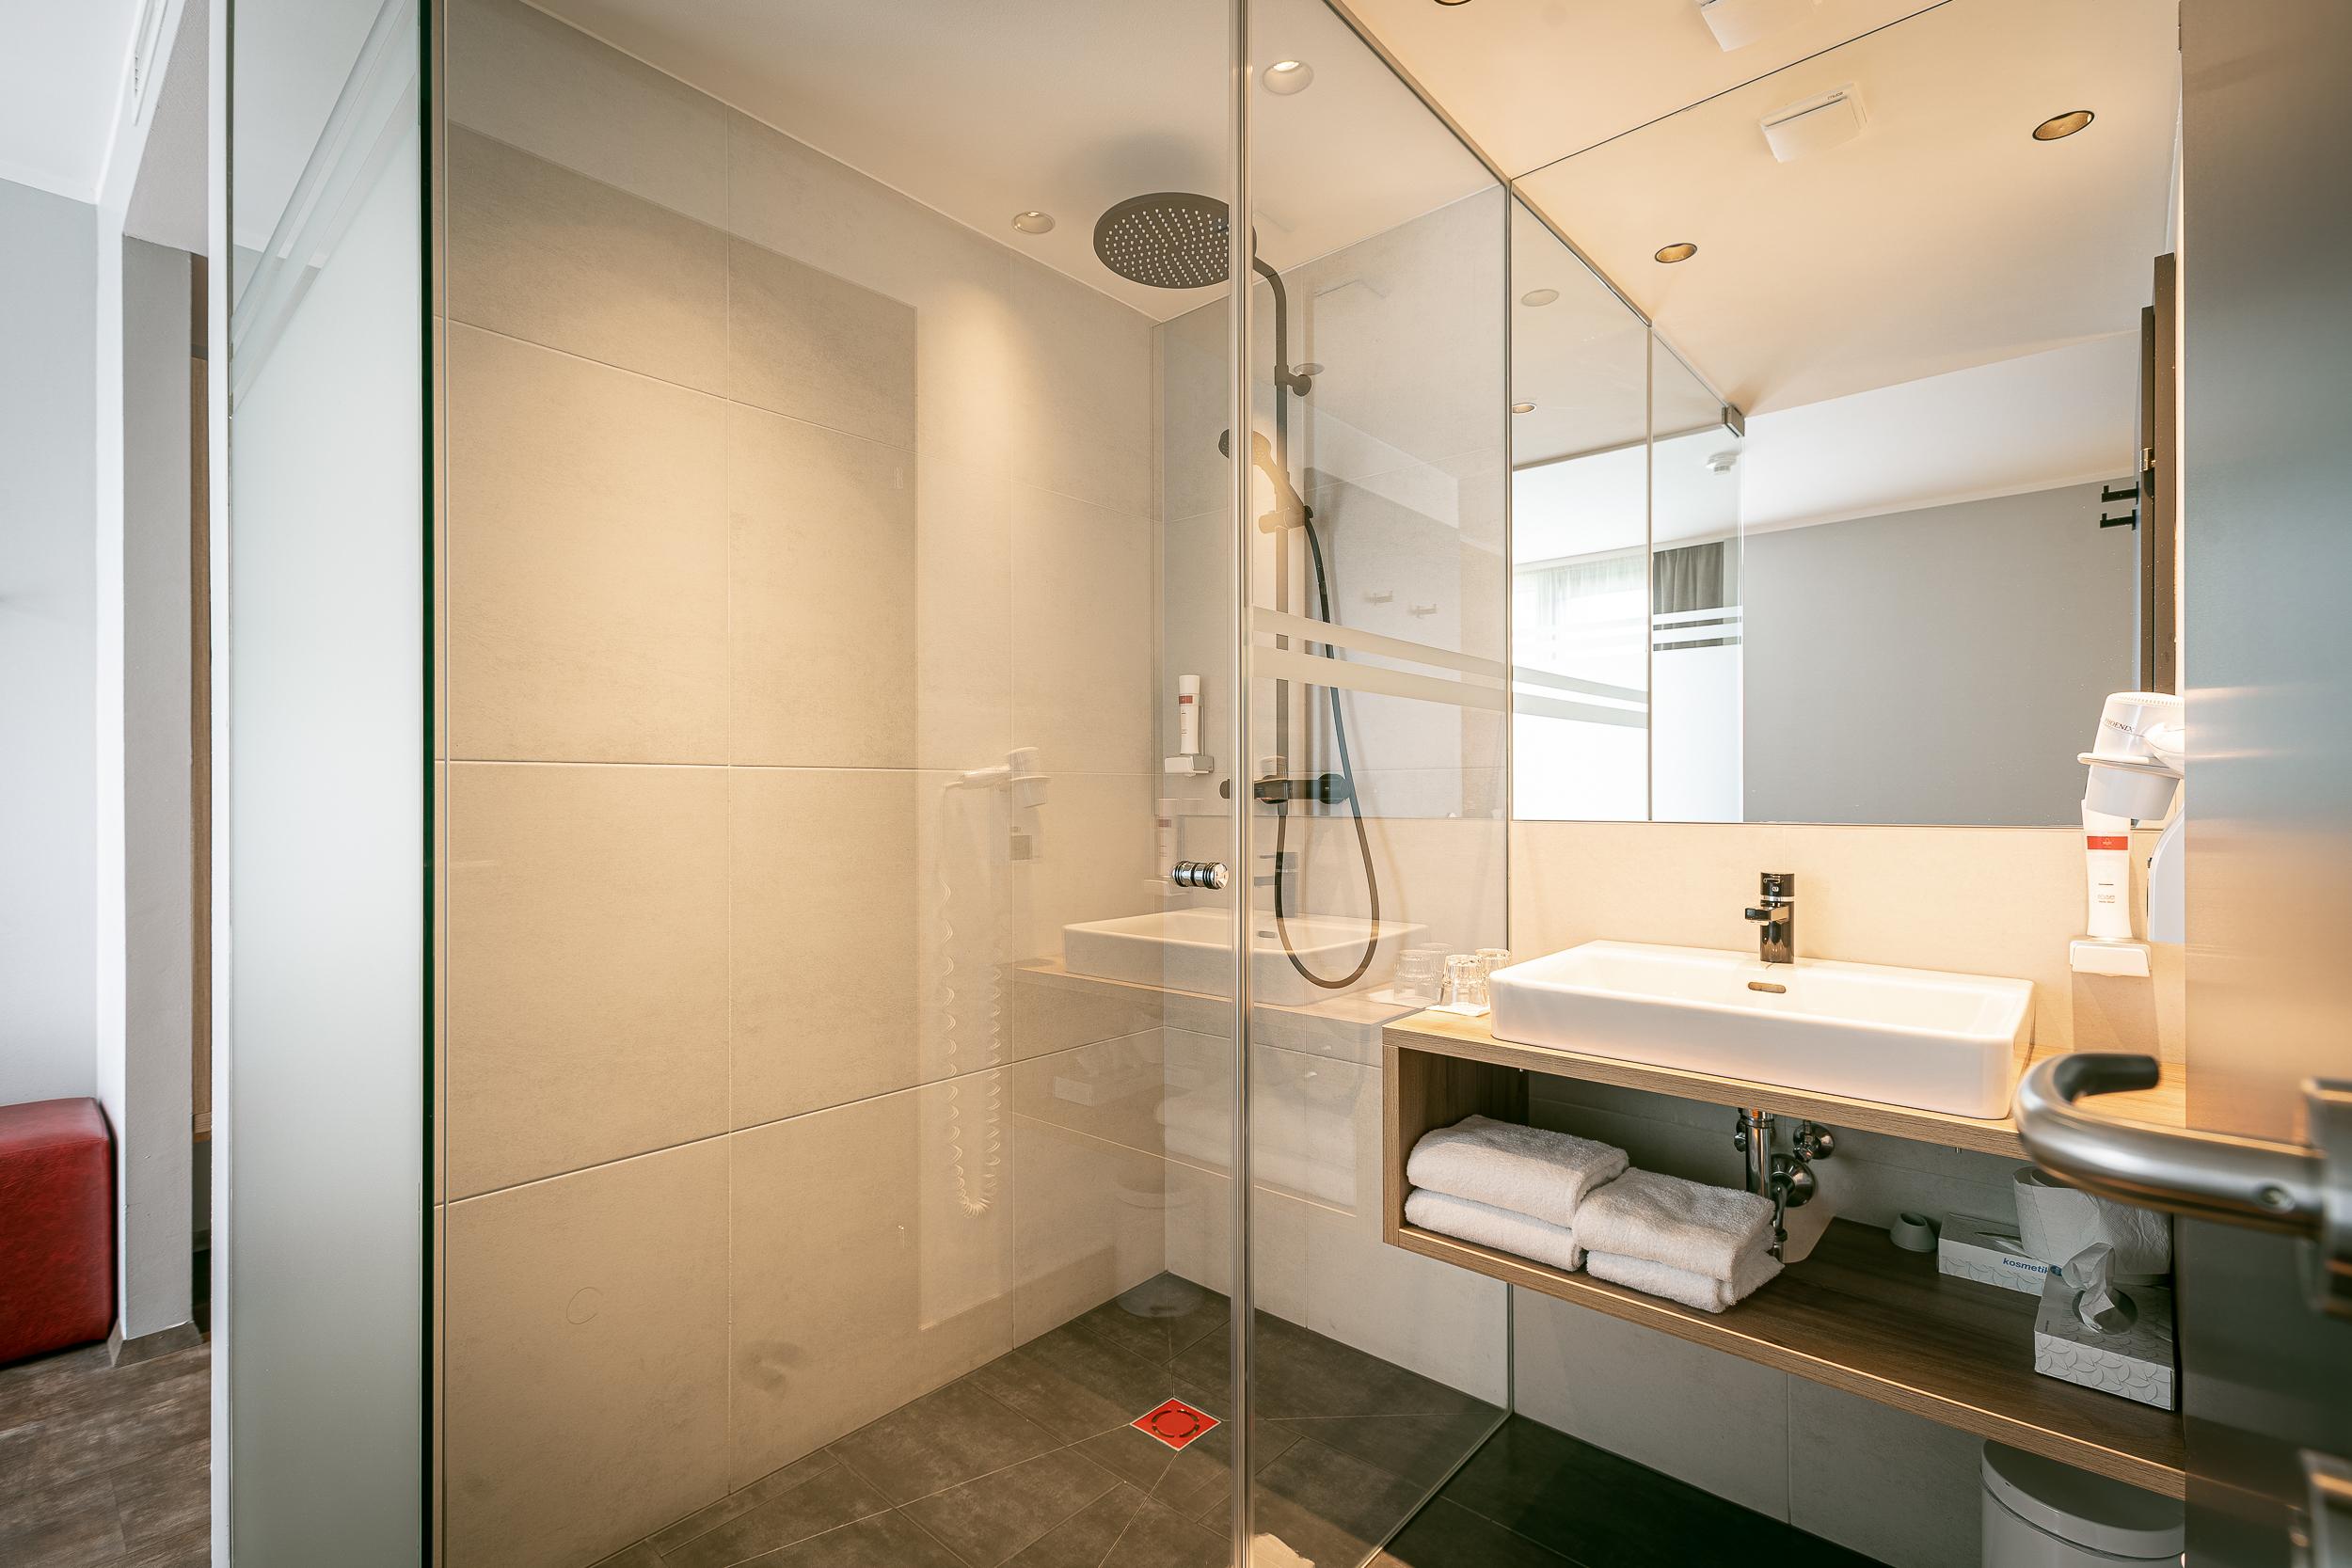 zimmer superior doppelzimmer ohne balkon bad hotel rocket rooms velden